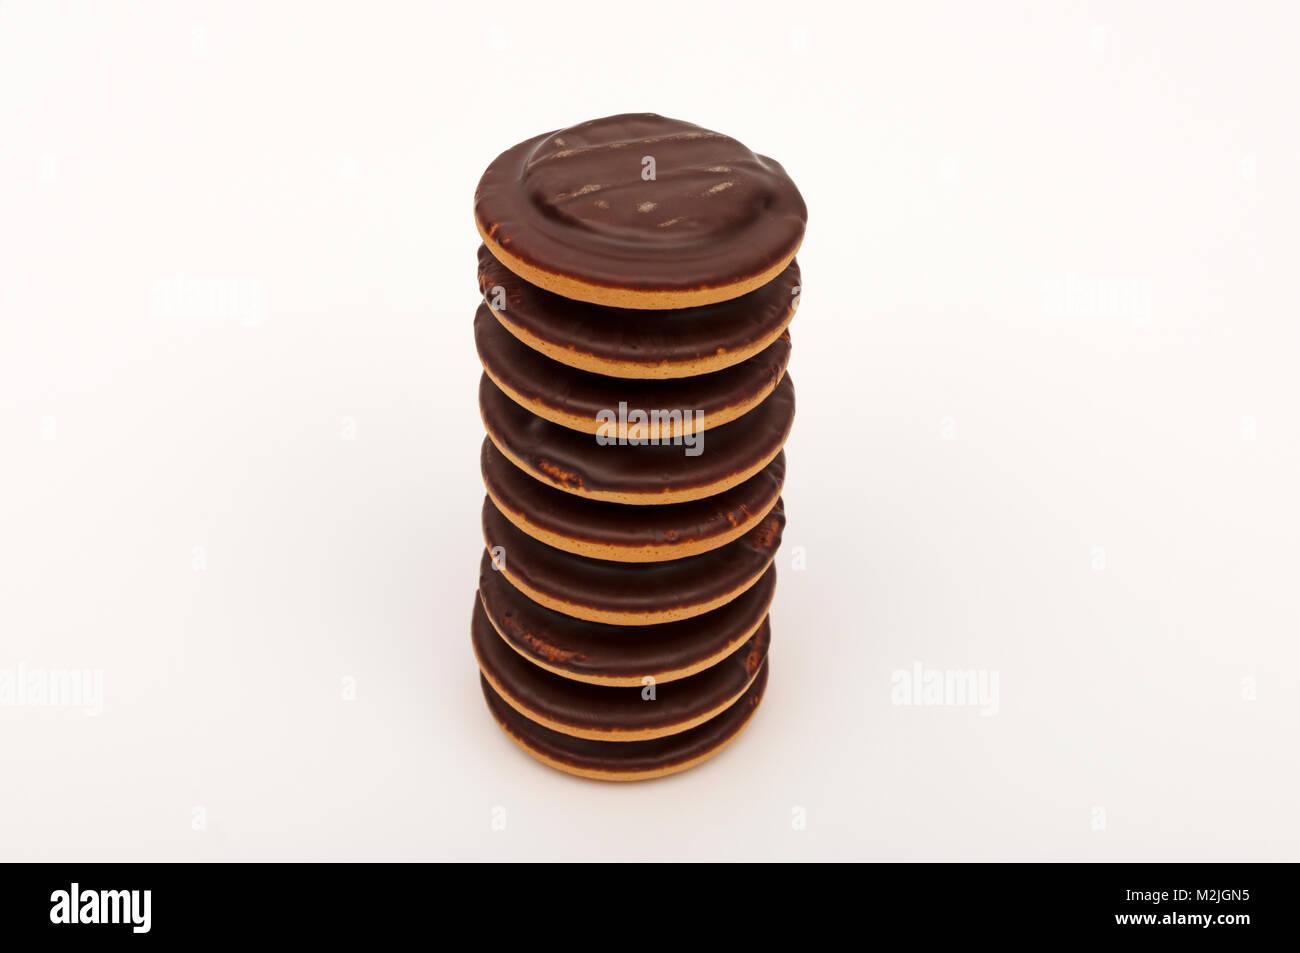 jaffa cakes - Stock Image